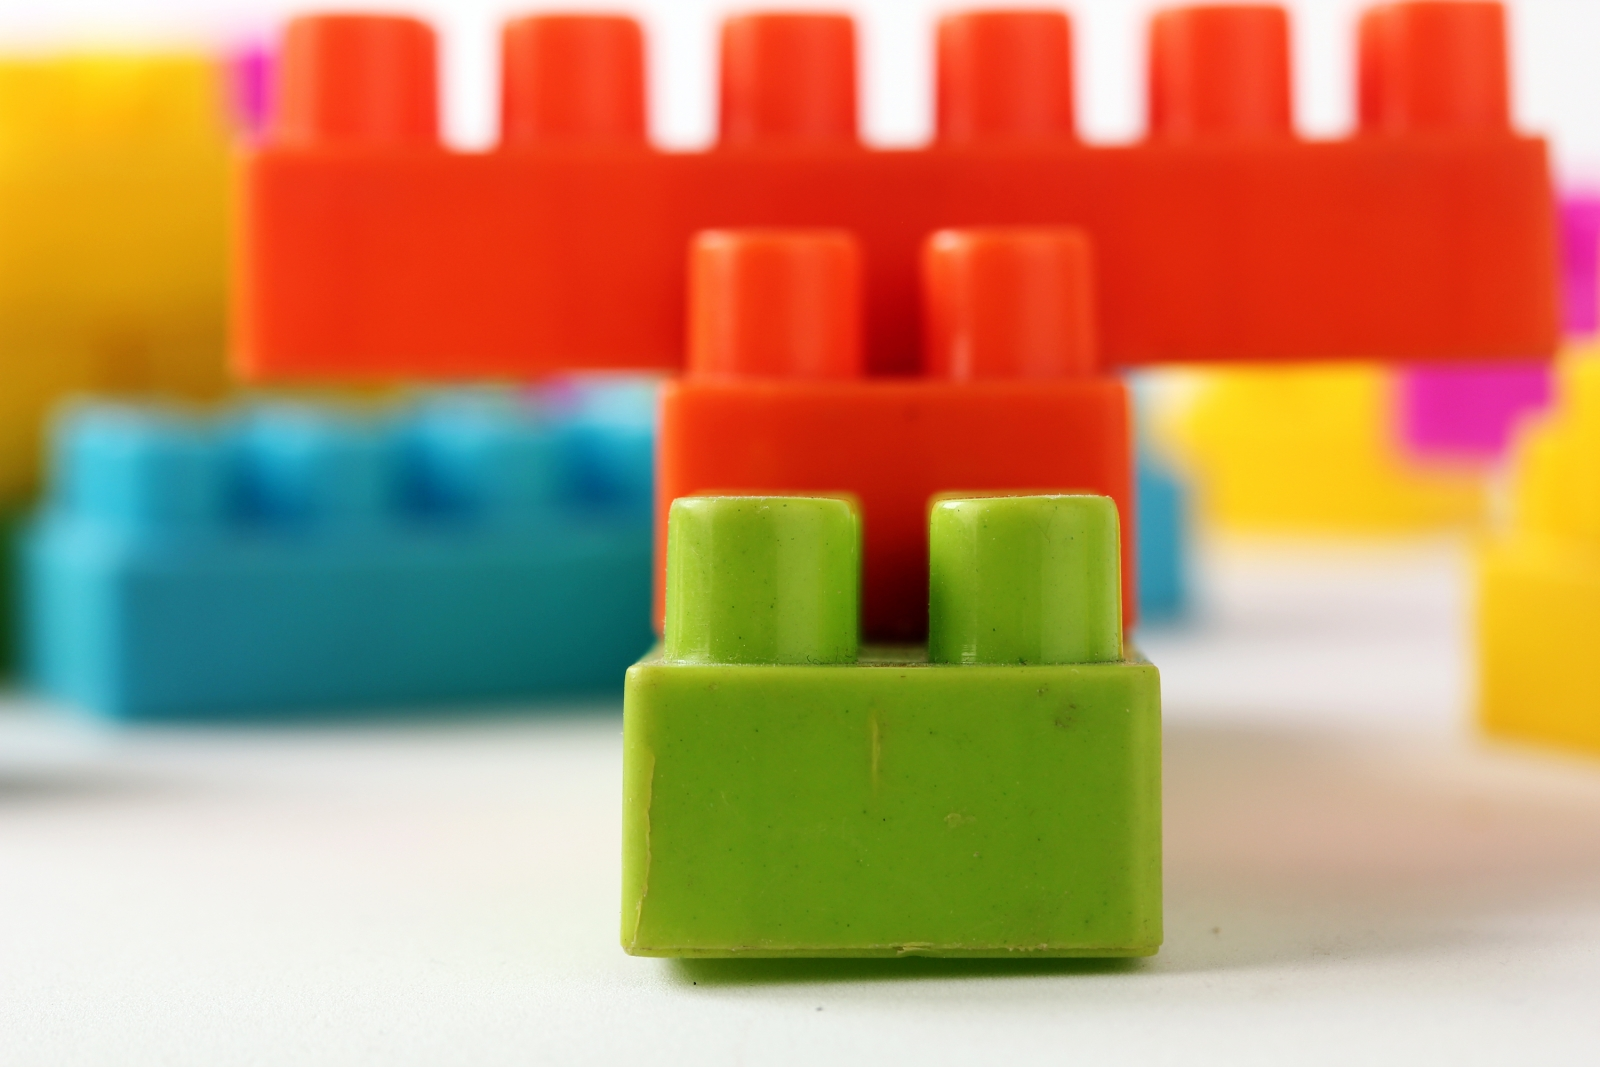 http://katipiran.wordpress.com/tag/lego-mp3-player/